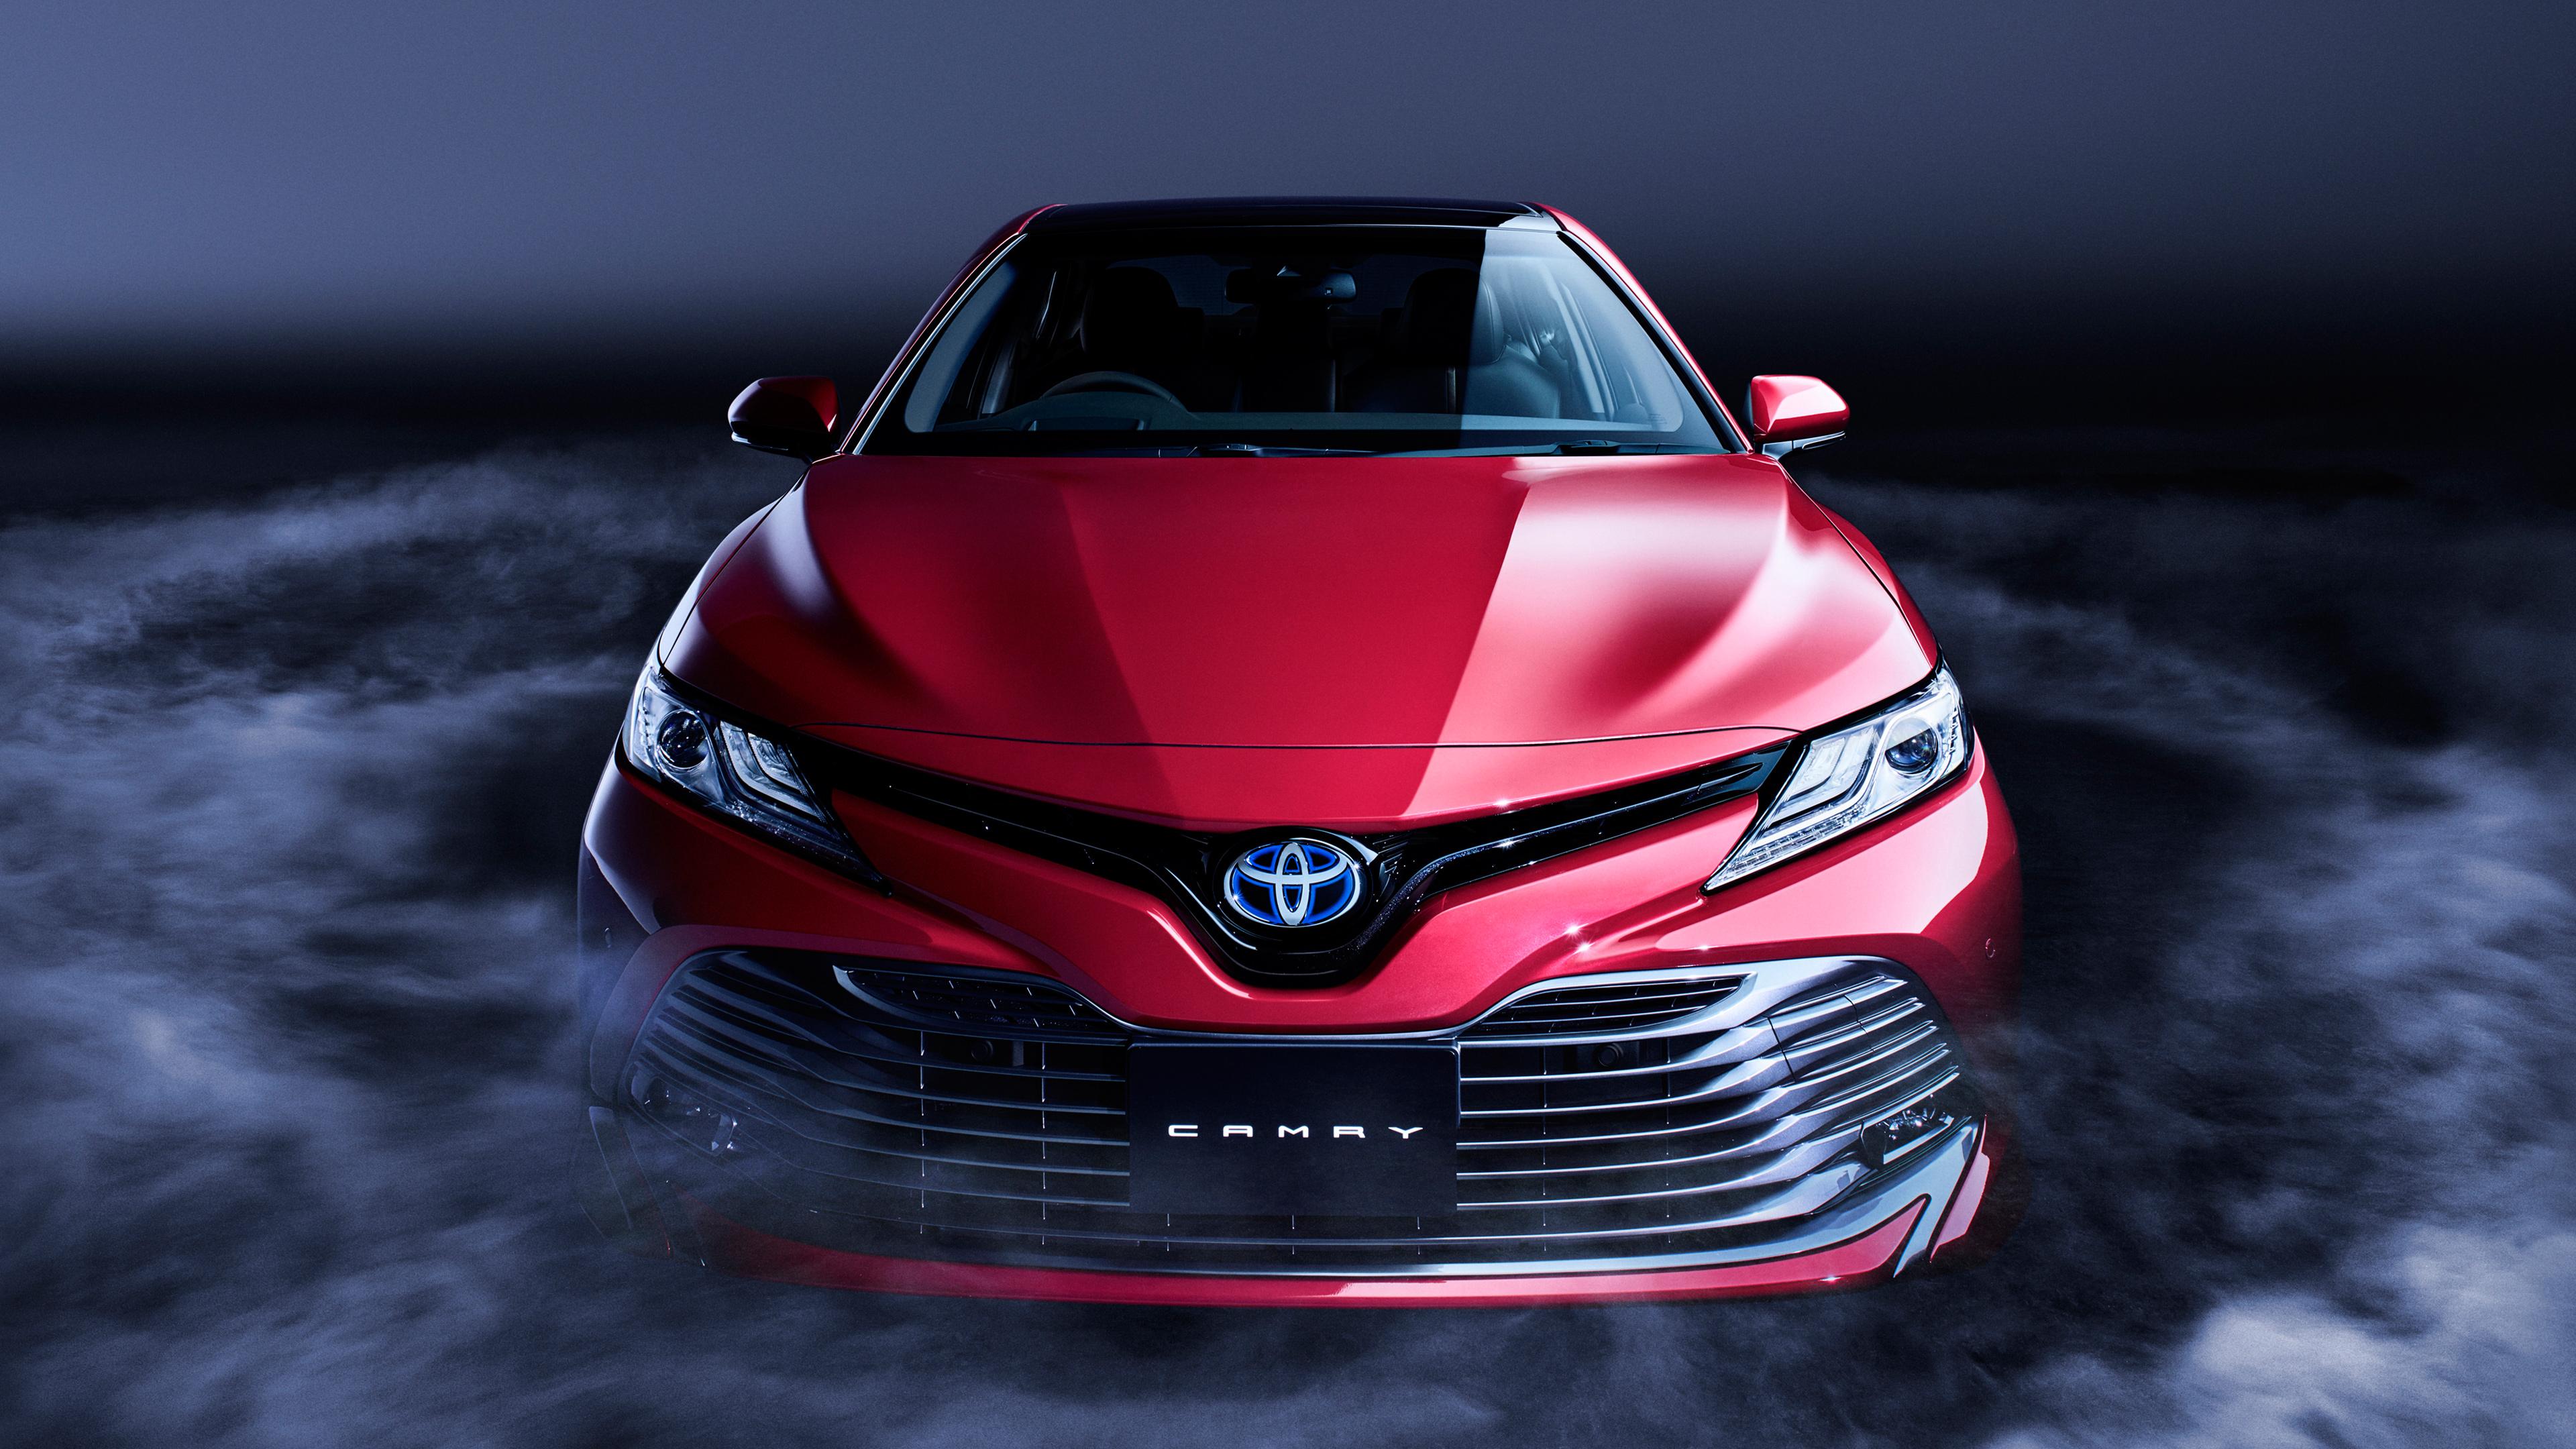 2018 Toyota Camry Hybrid 4K Wallpaper HD Car Wallpapers ID 7933 3840x2160